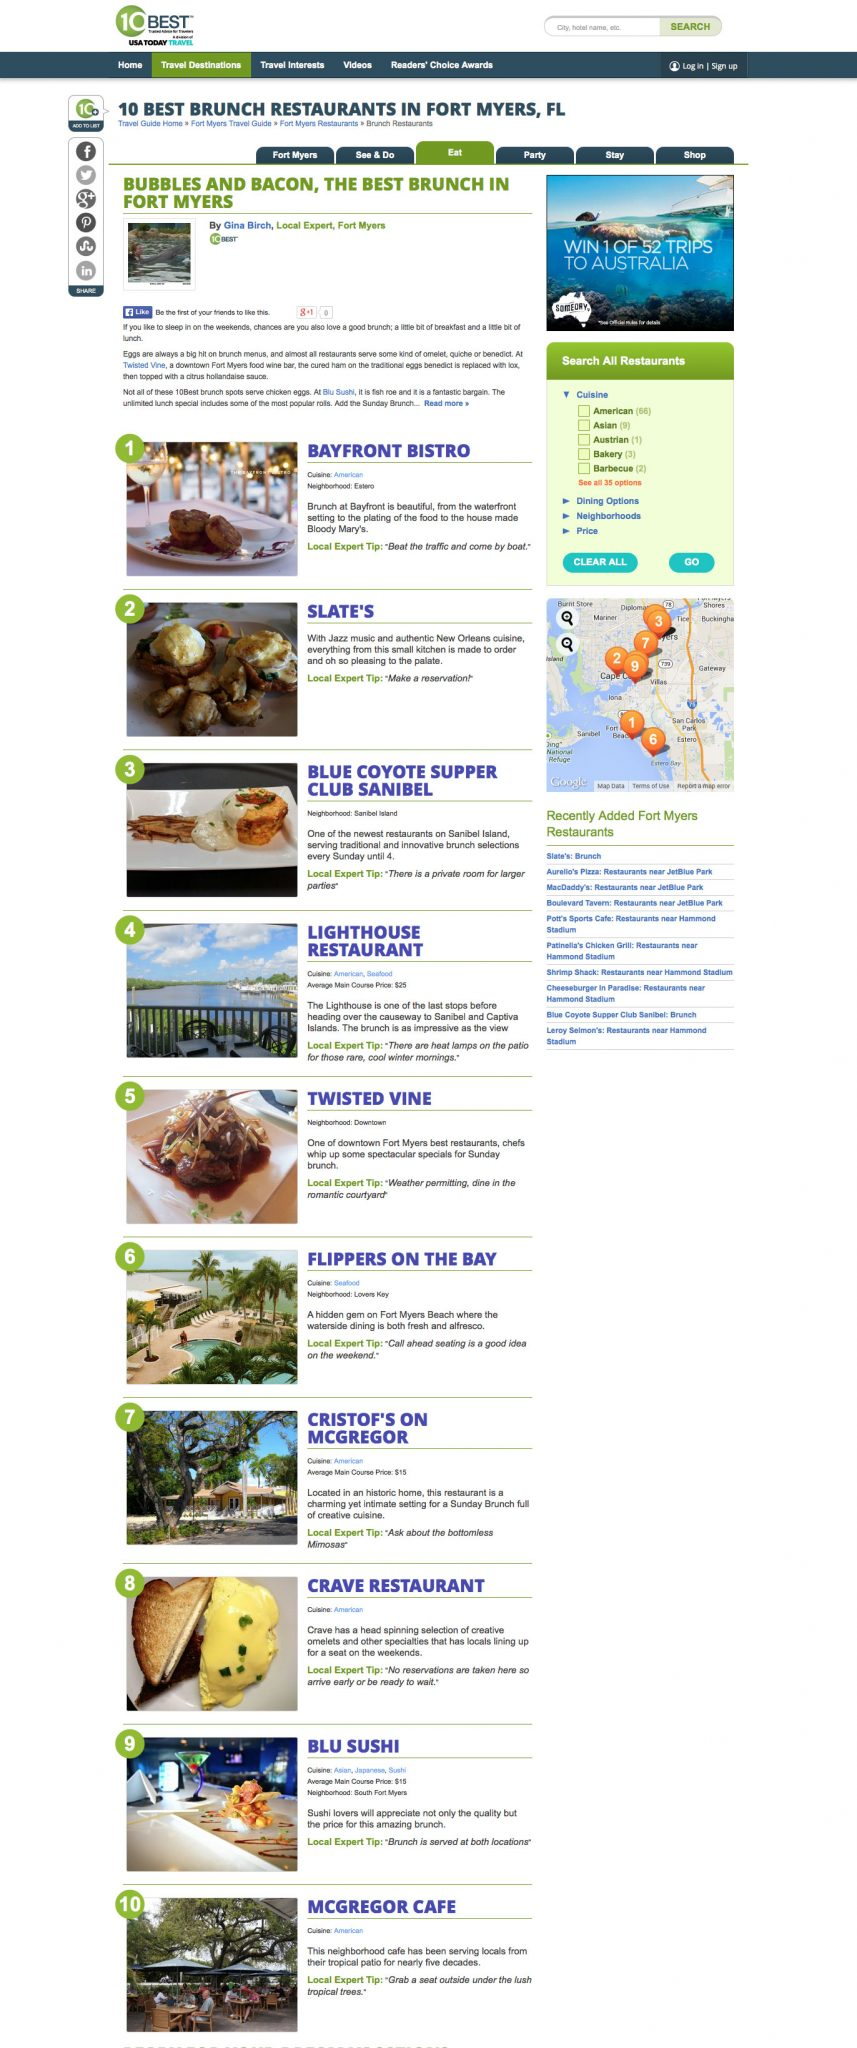 Flippers Named One Of 10 Best Brunch Restaurants In Fort Myers Fl